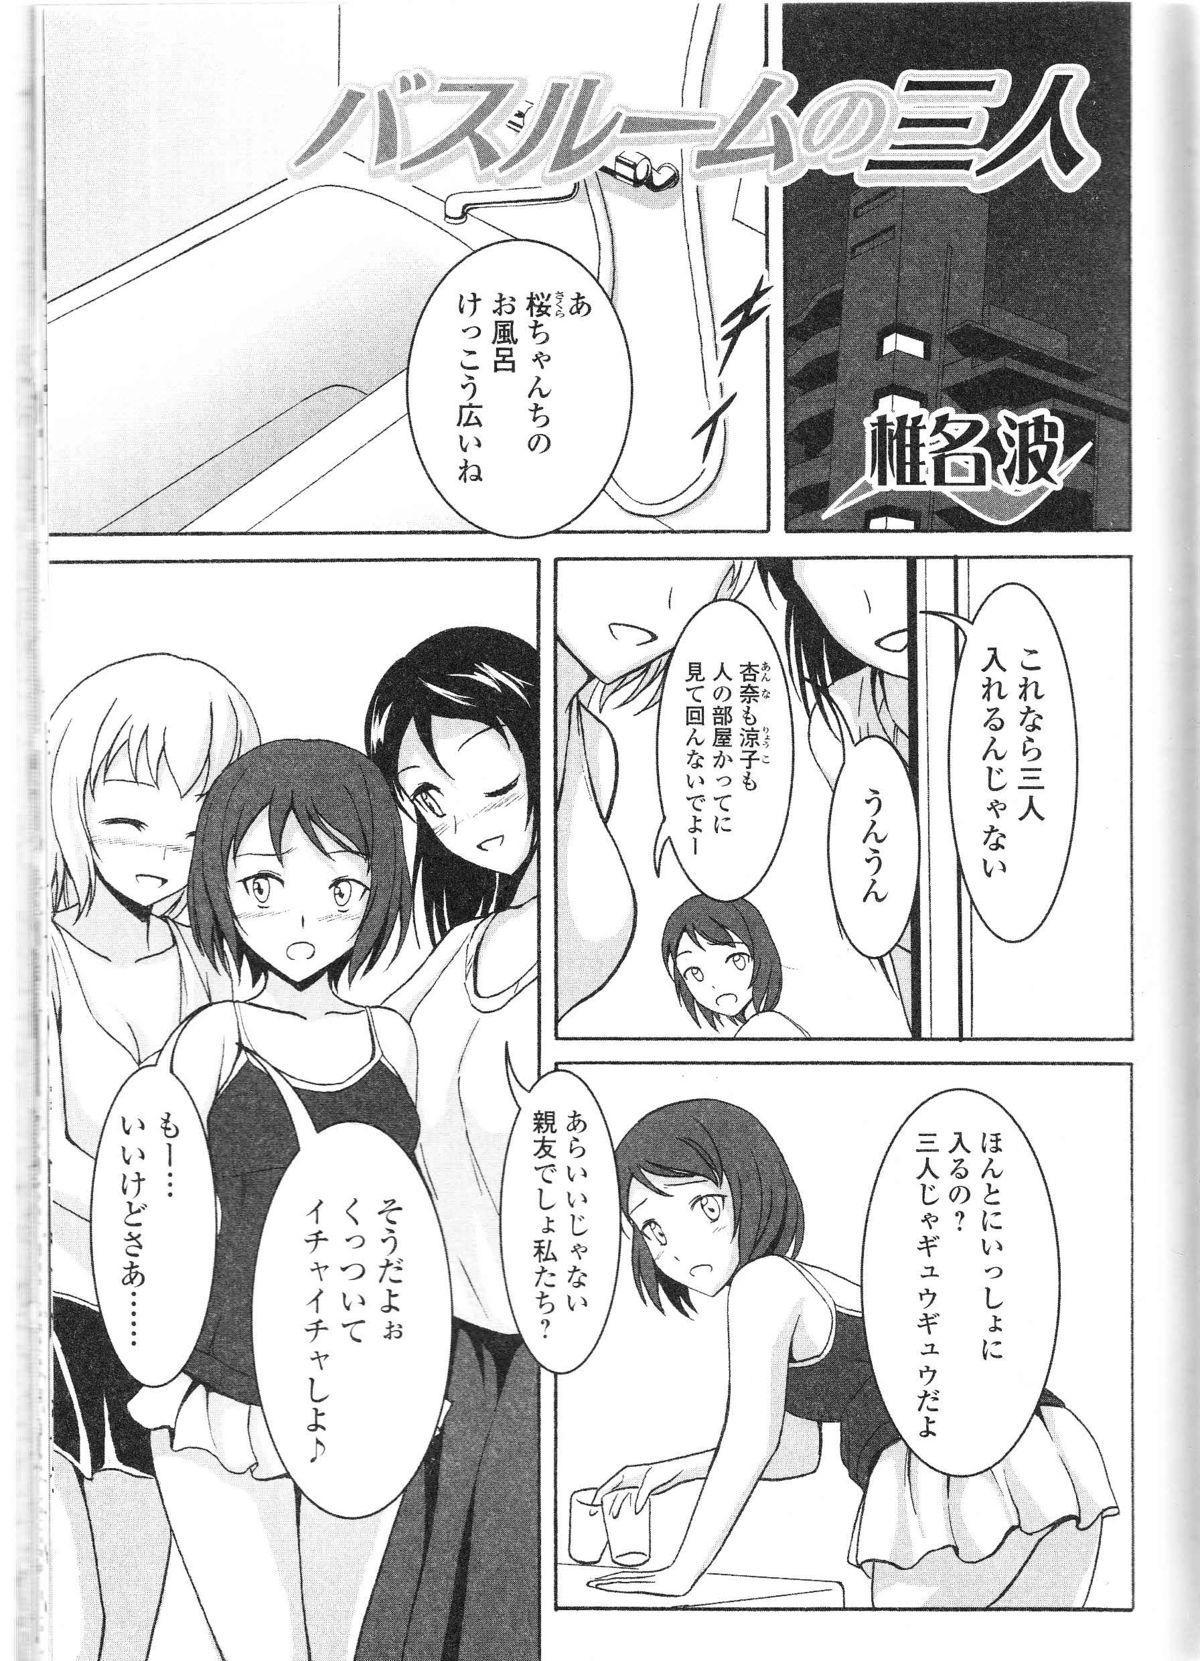 Nozoite wa Ikenai 9 - Do Not Peep! 9 87